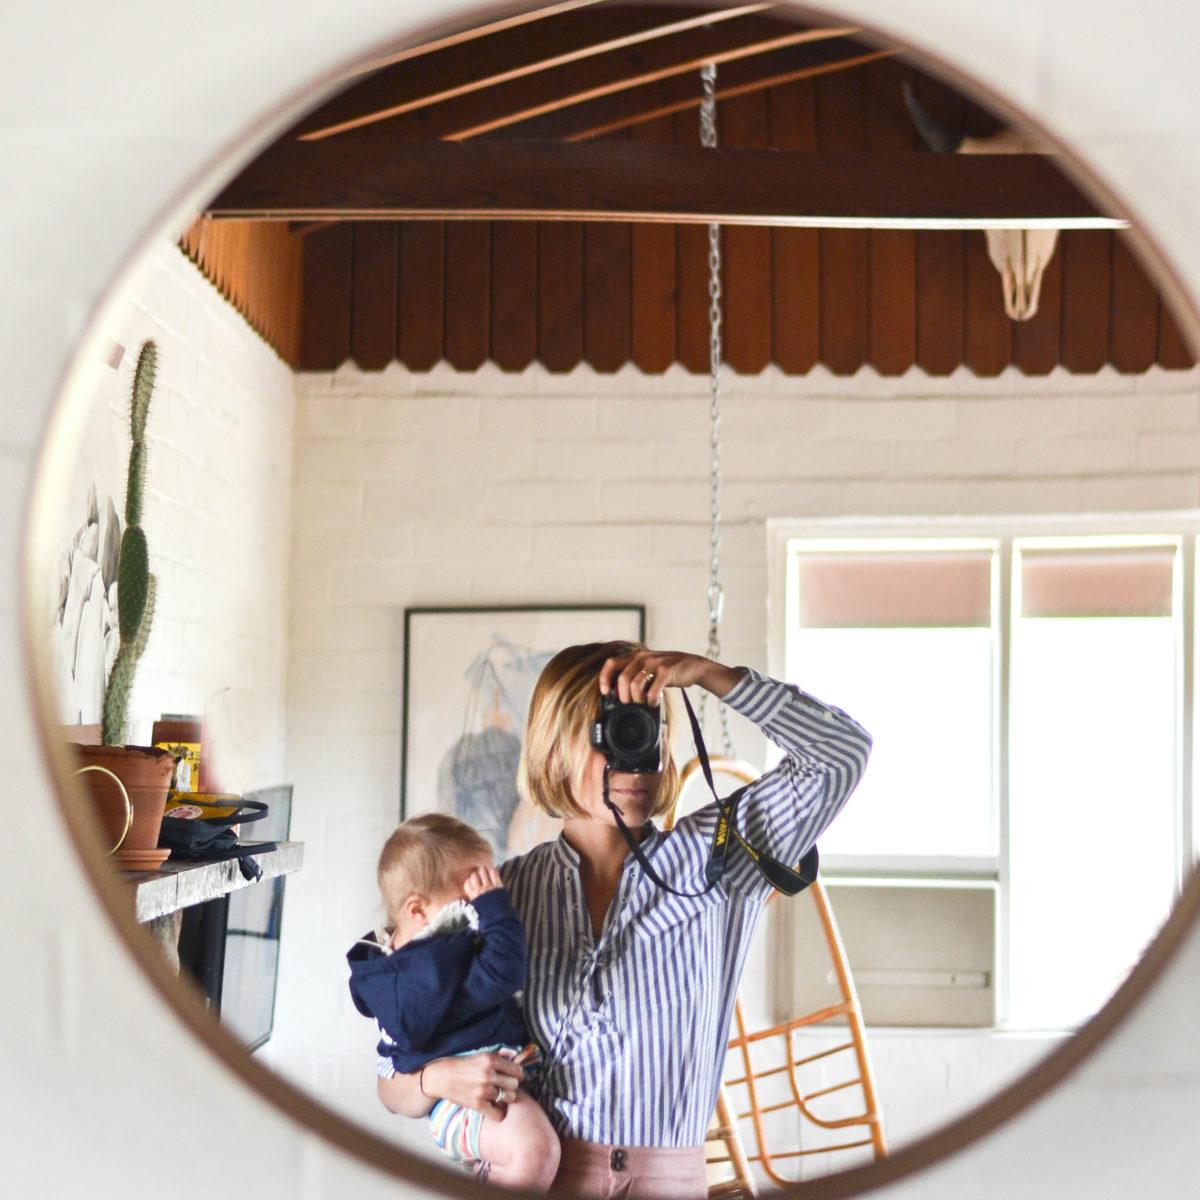 Decorative Mirrors That Won't Break Your Budget